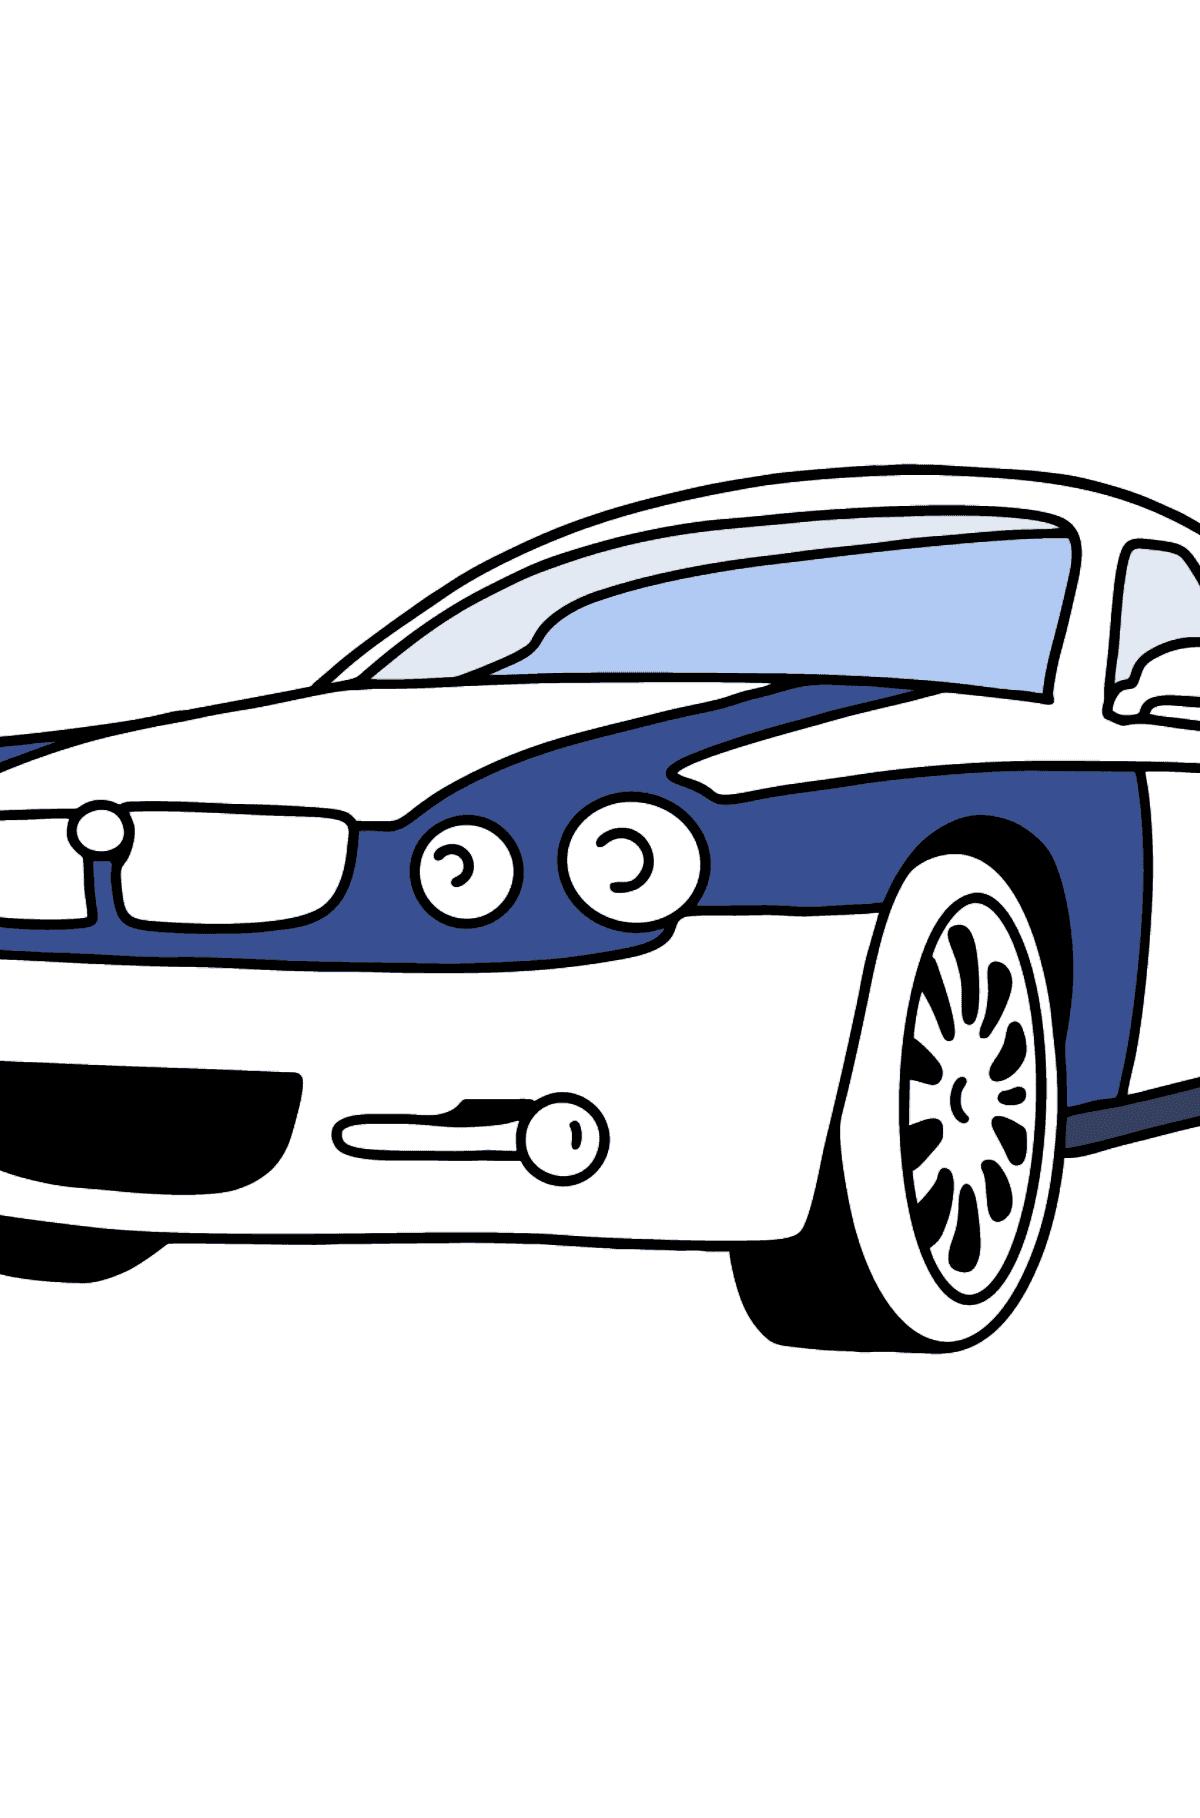 Jaguar GT coloring page - Coloring Pages for Kids